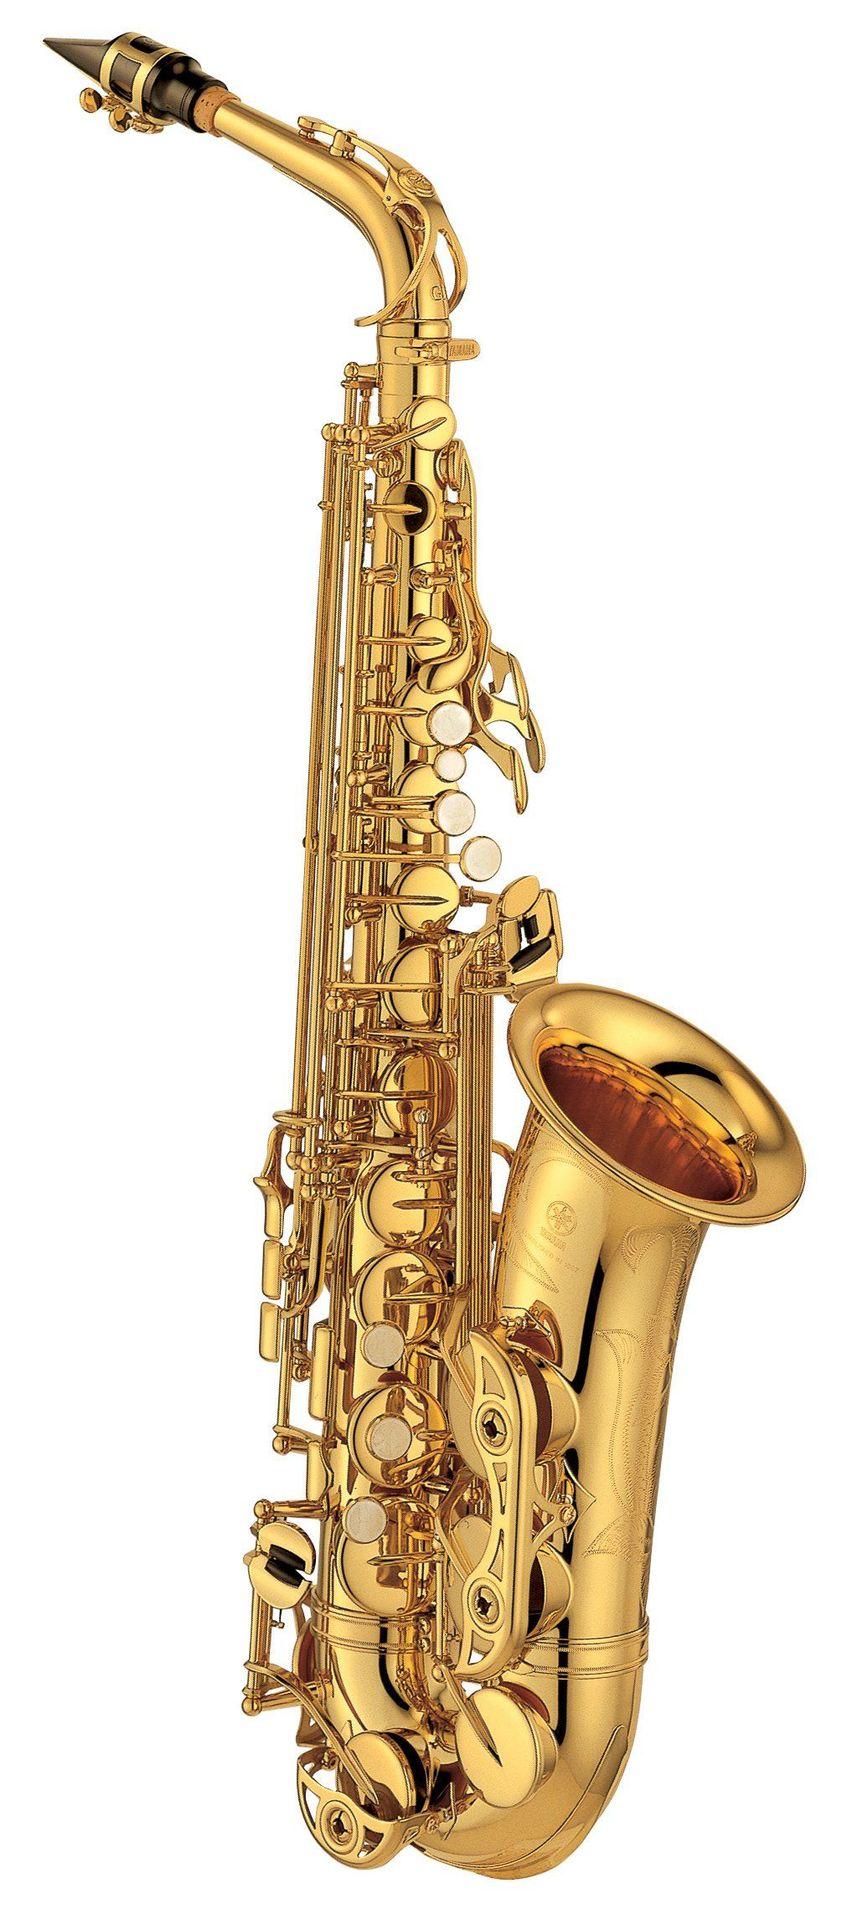 Yamaha YAS-62-04 Es-Altsaxophon, incl. Etui u. Zubehör